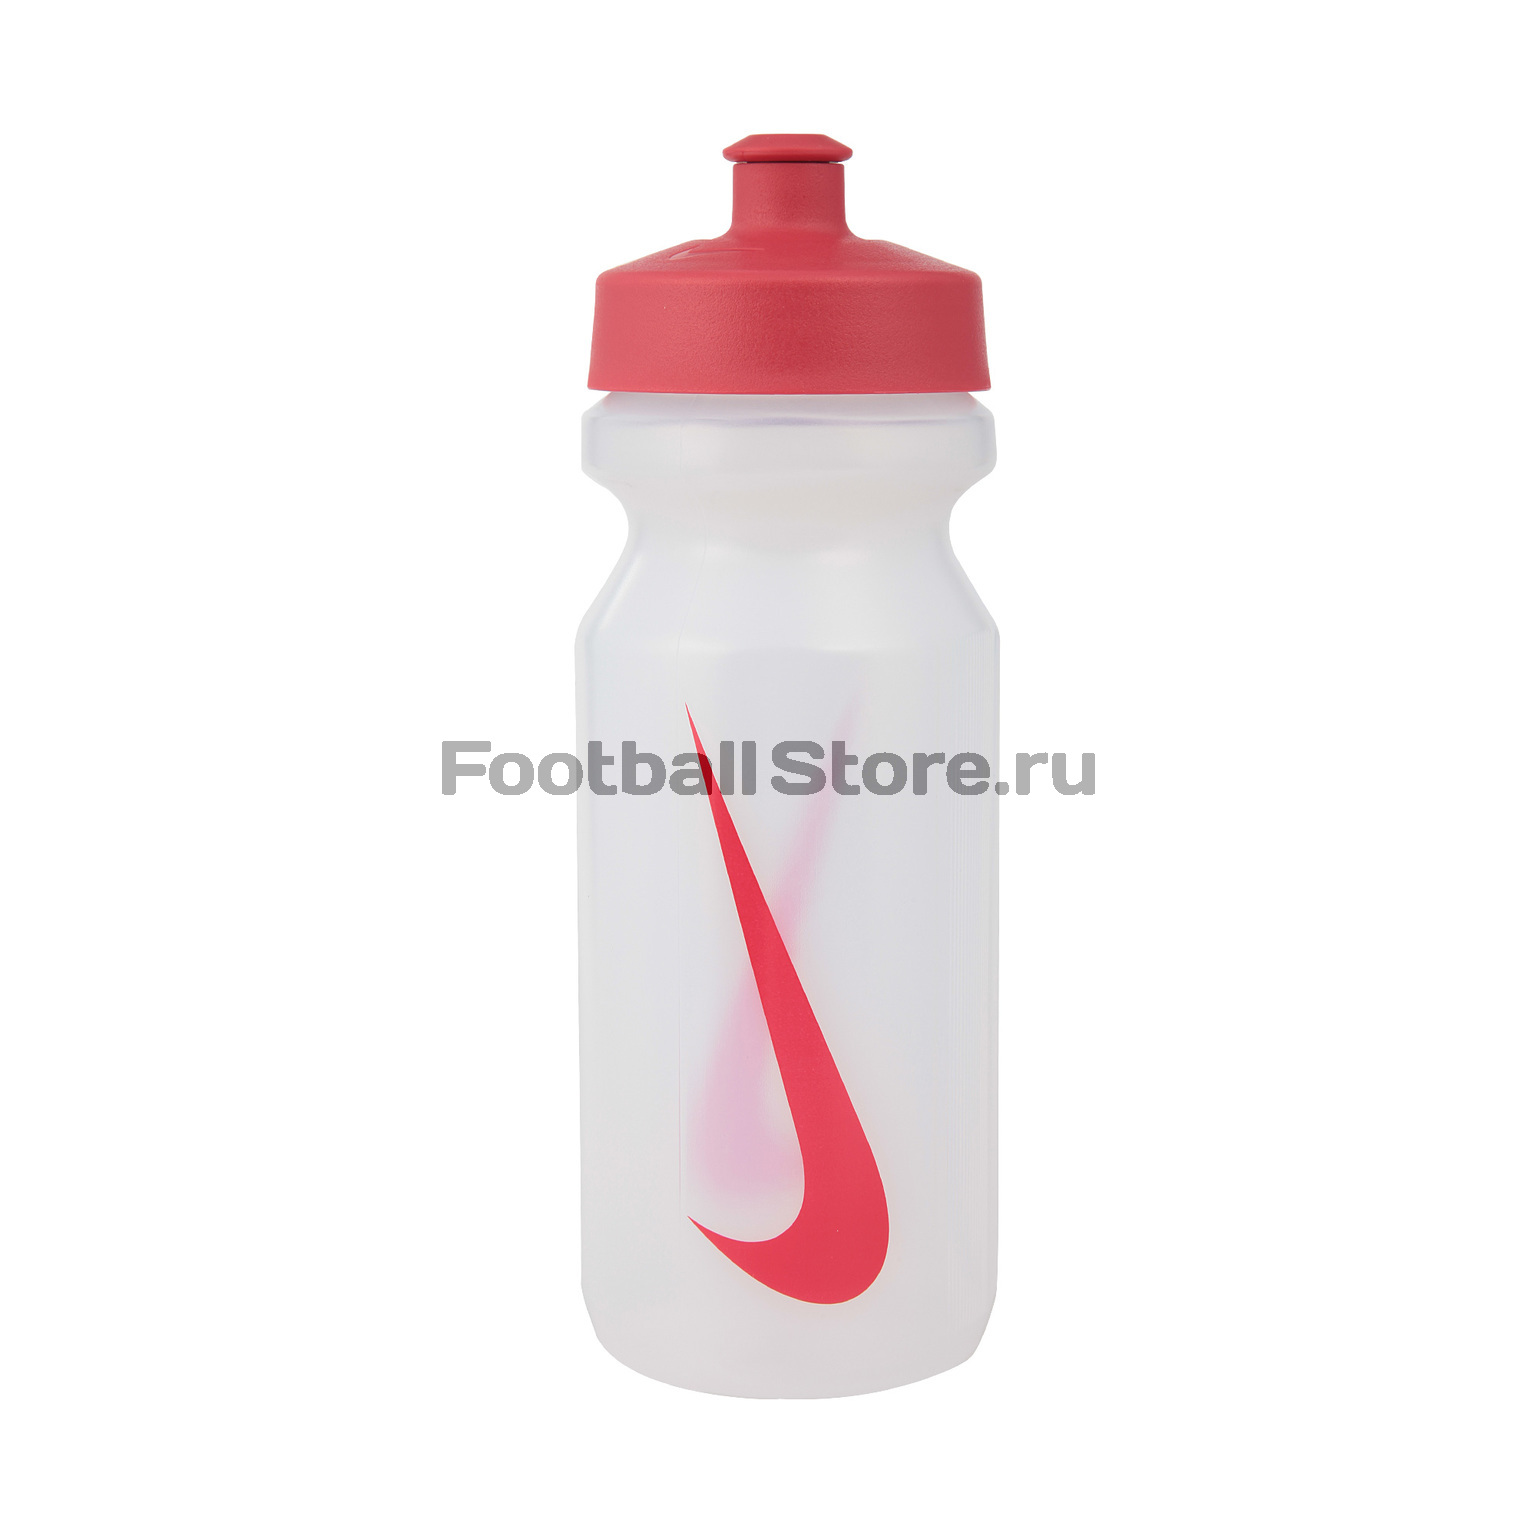 Бутылка для воды Nike Big Mouth Water 220 Z Clear Sport N.OB.17.946.22